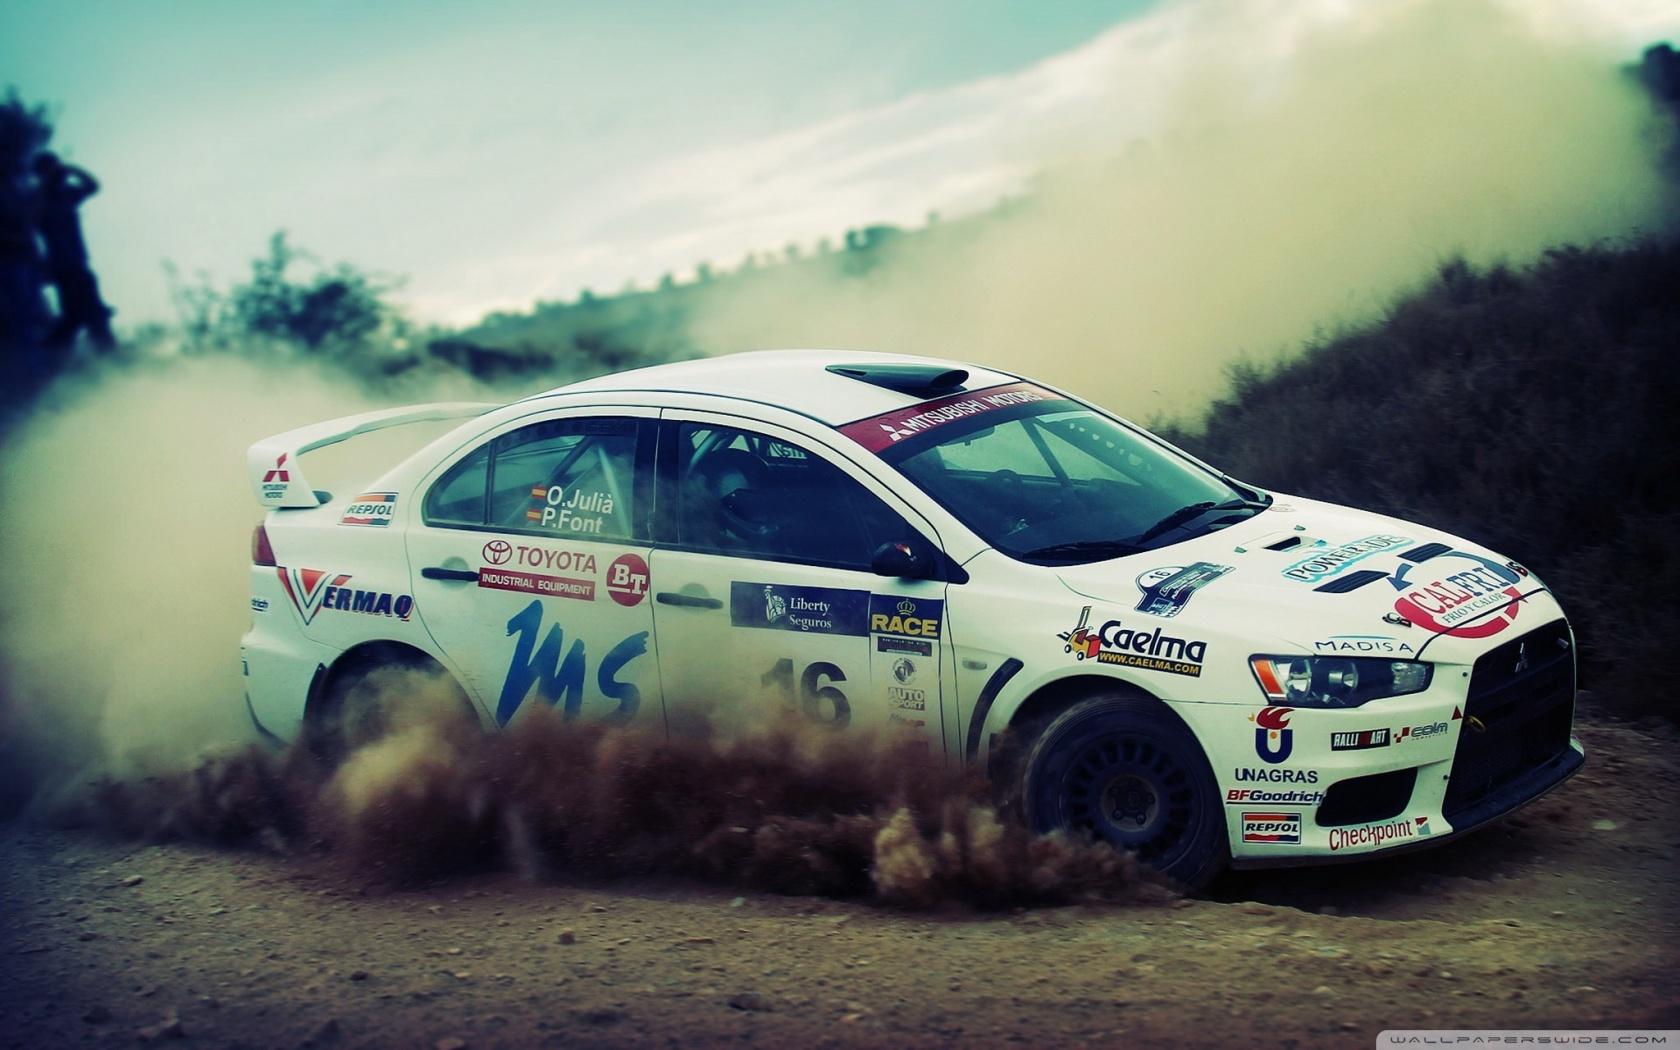 Mix Wallpaper Full Hd Lancer Evolution Rally 4k Hd Desktop Wallpaper For 4k